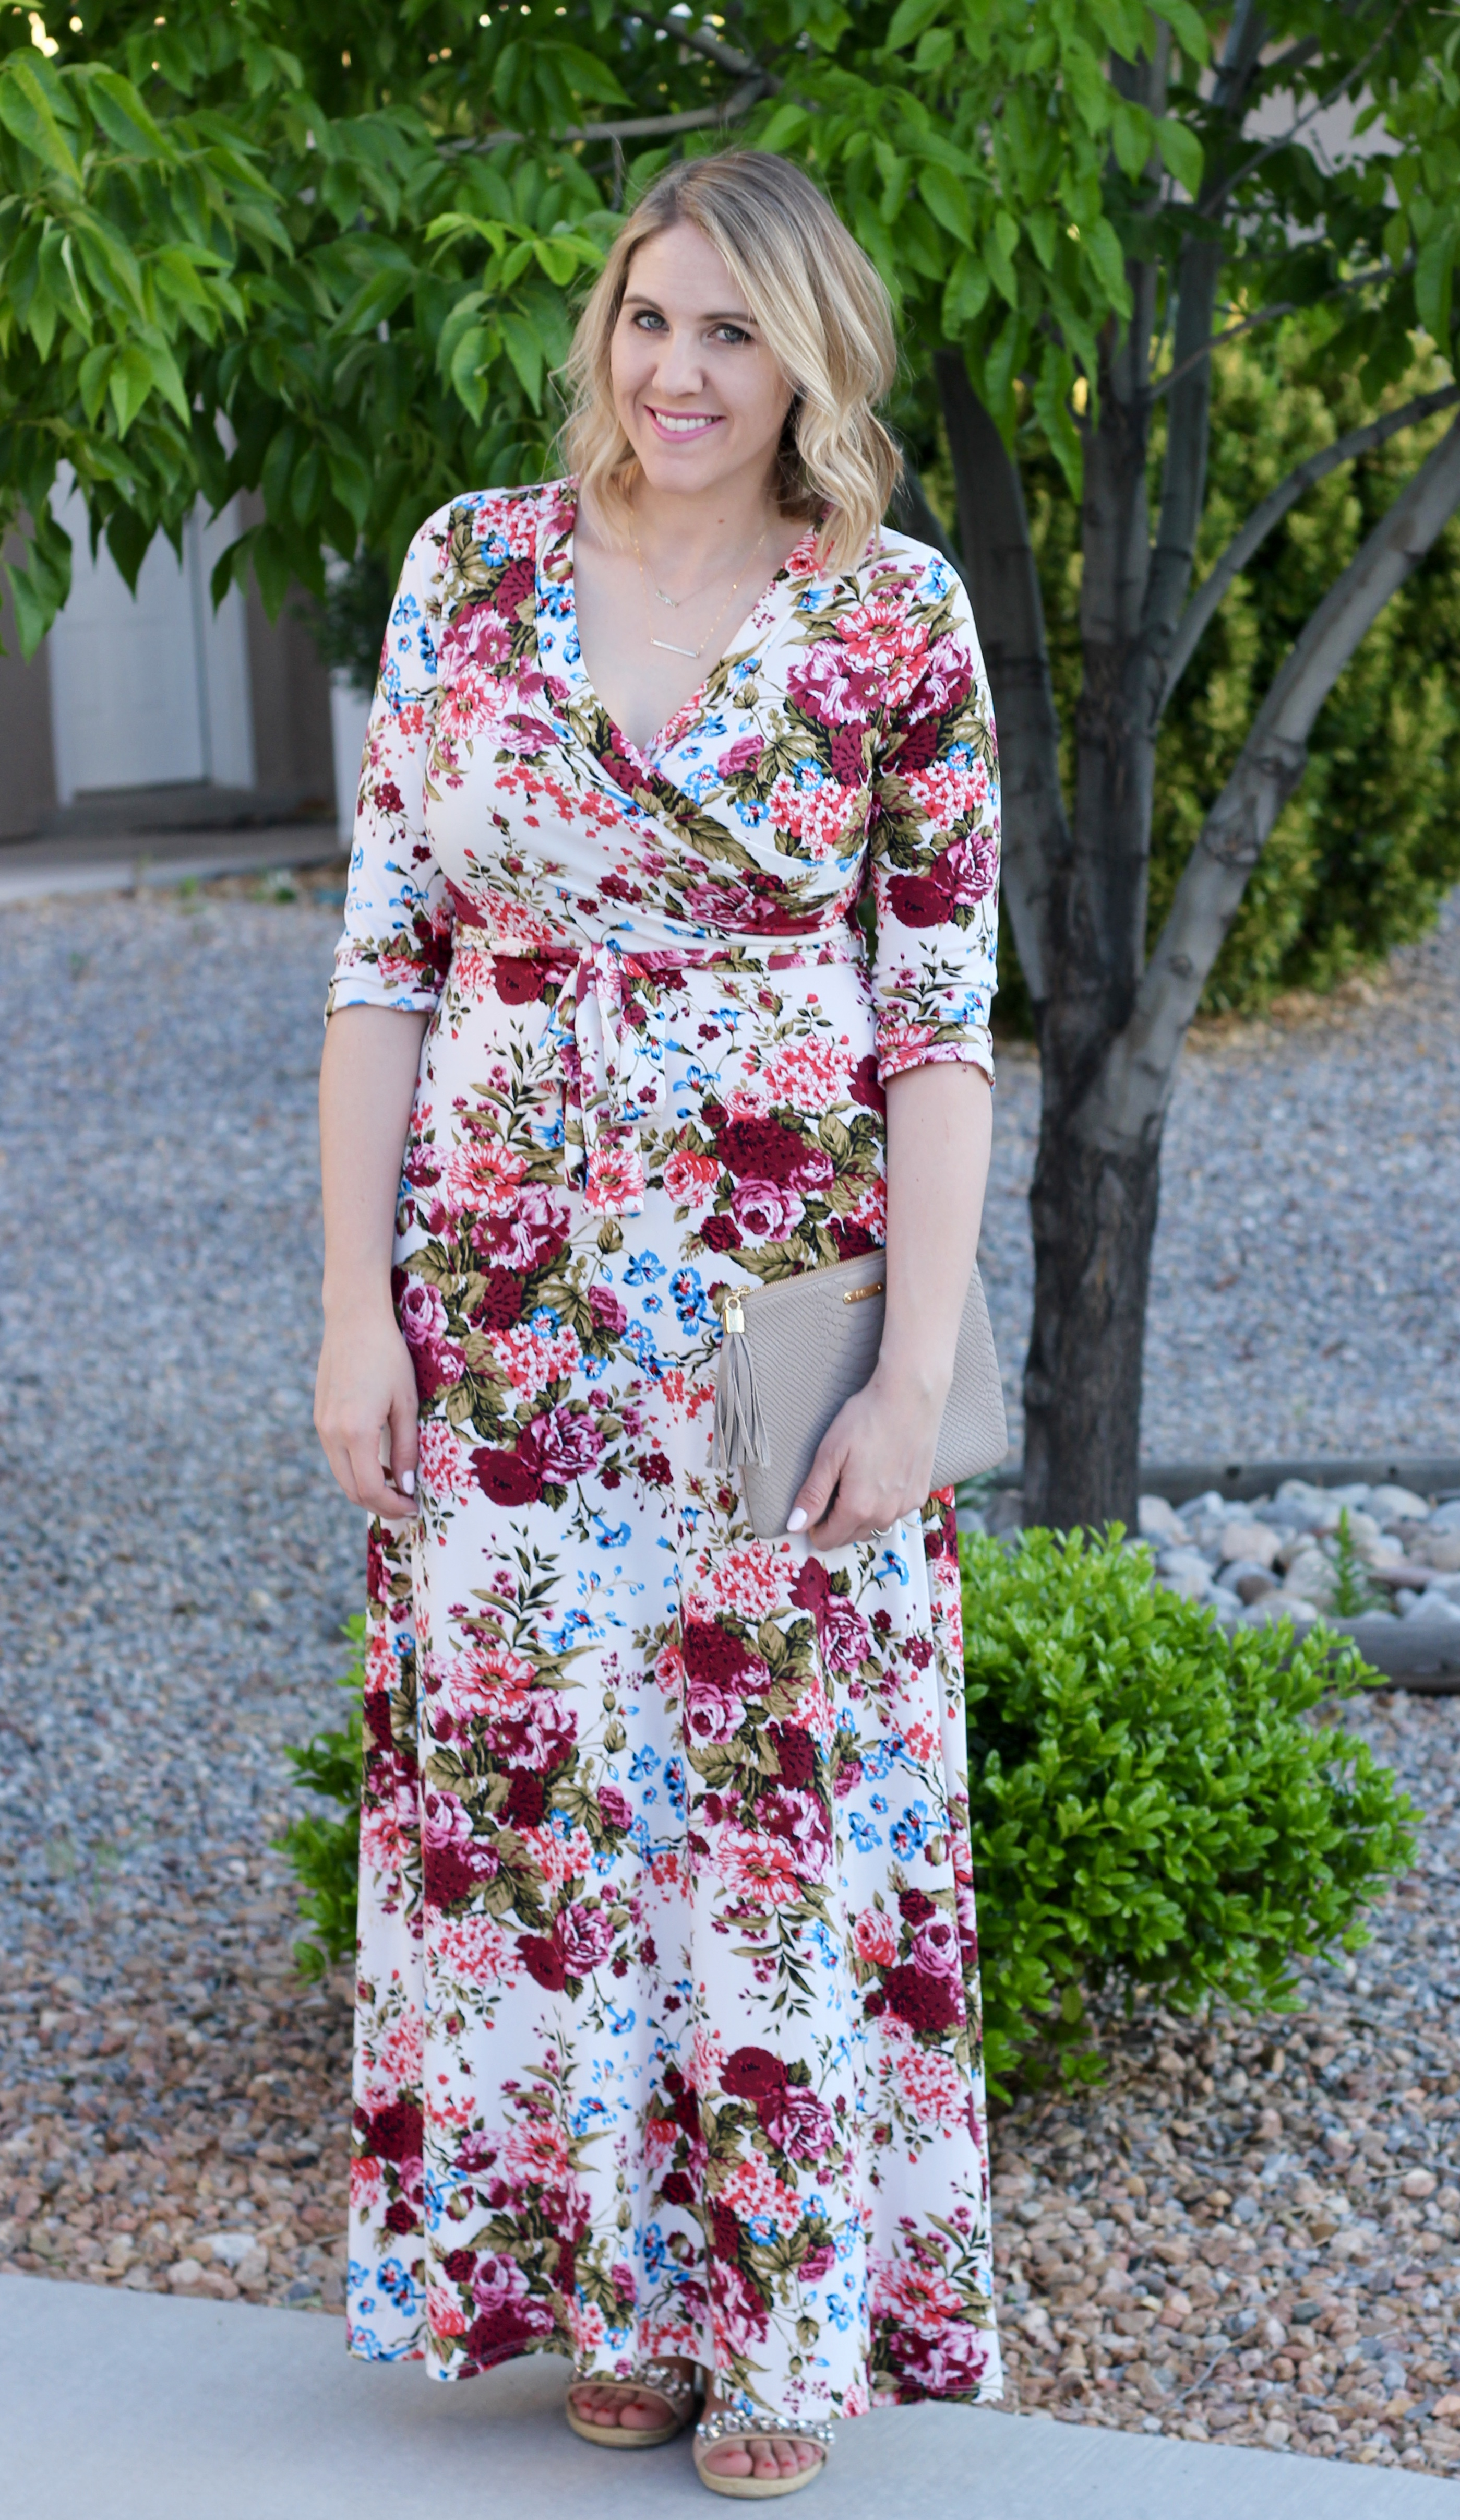 floral maxi dress pink blush, curvy style, #nursingfriendlydress #maxidress